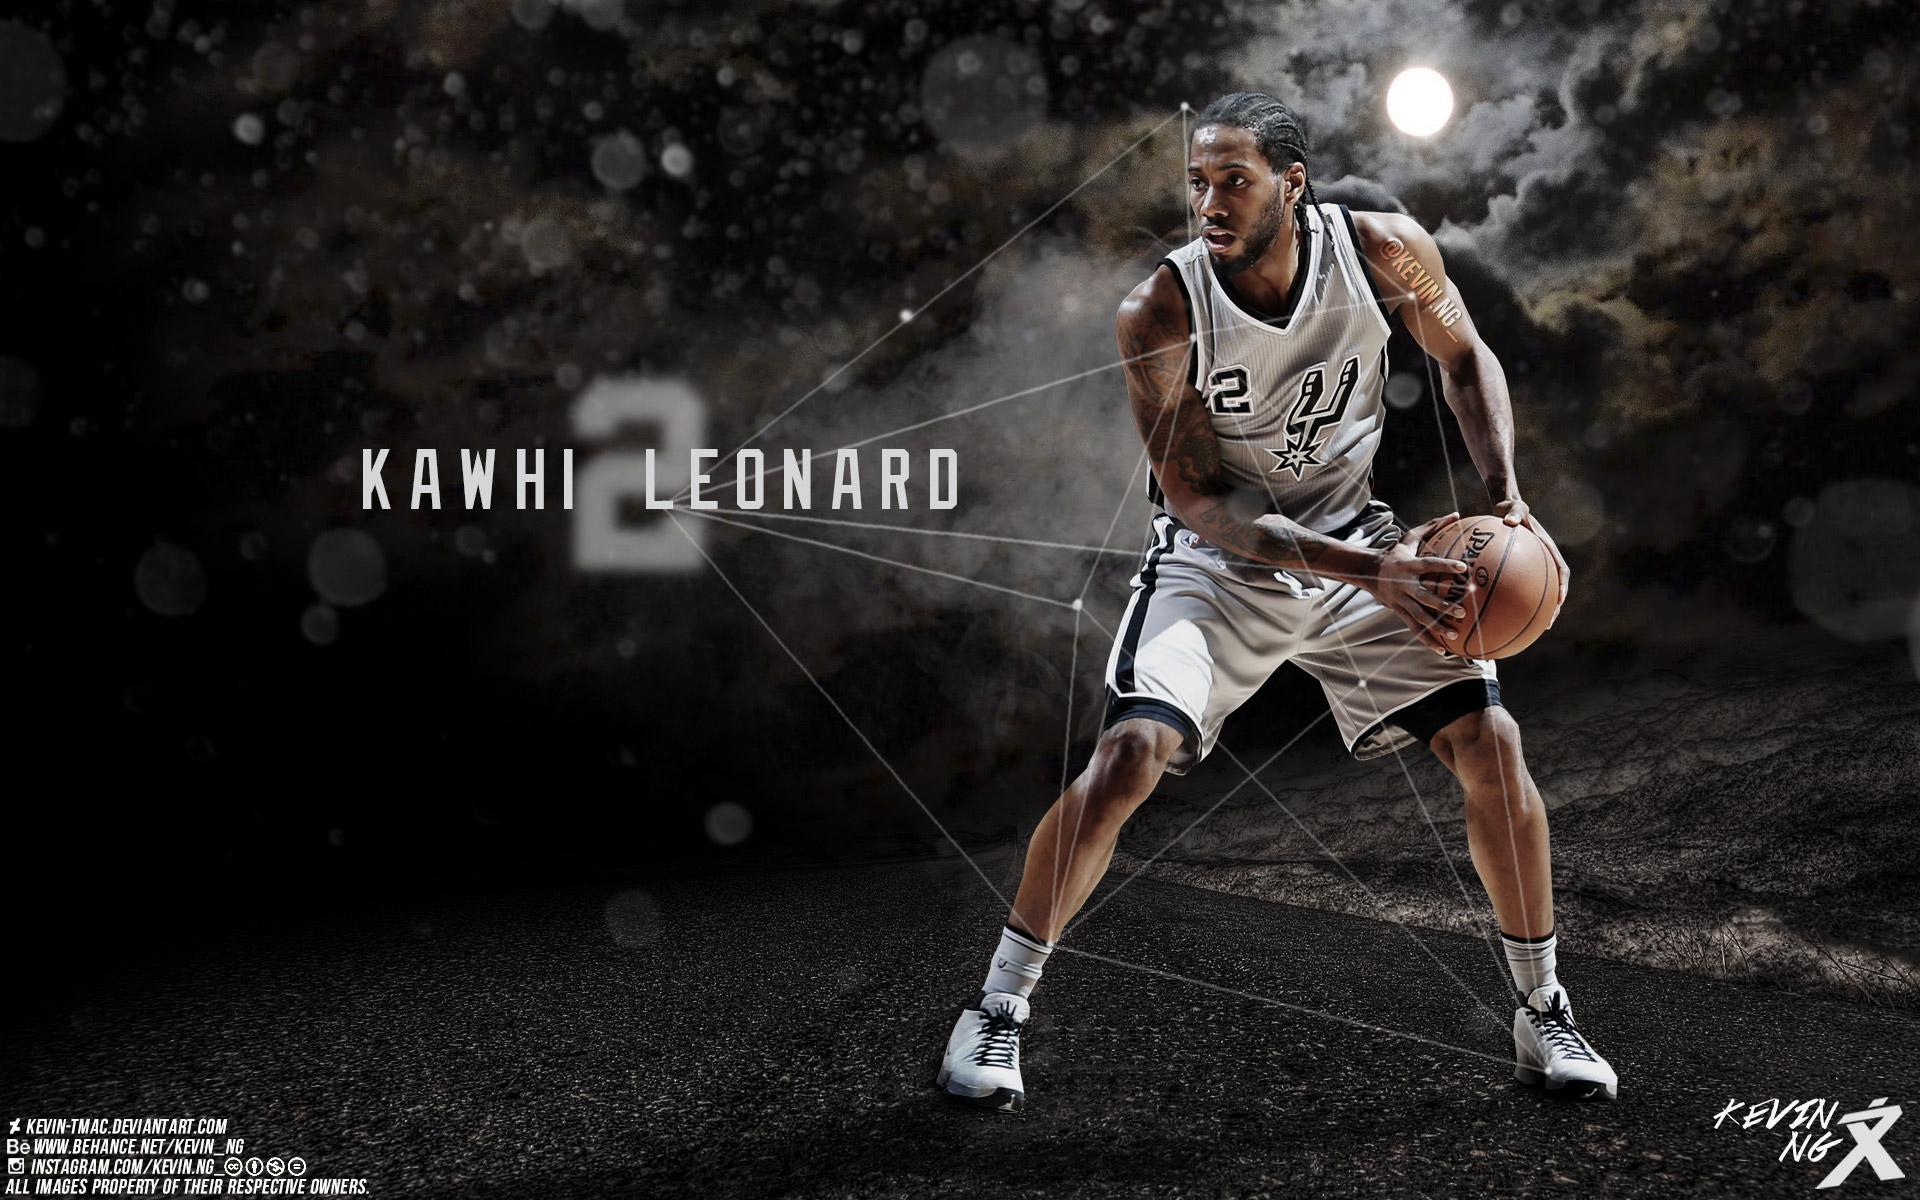 Kawhi Leonard San Antonio Spurs 2016 Wallpaper Basketball 1920x1200